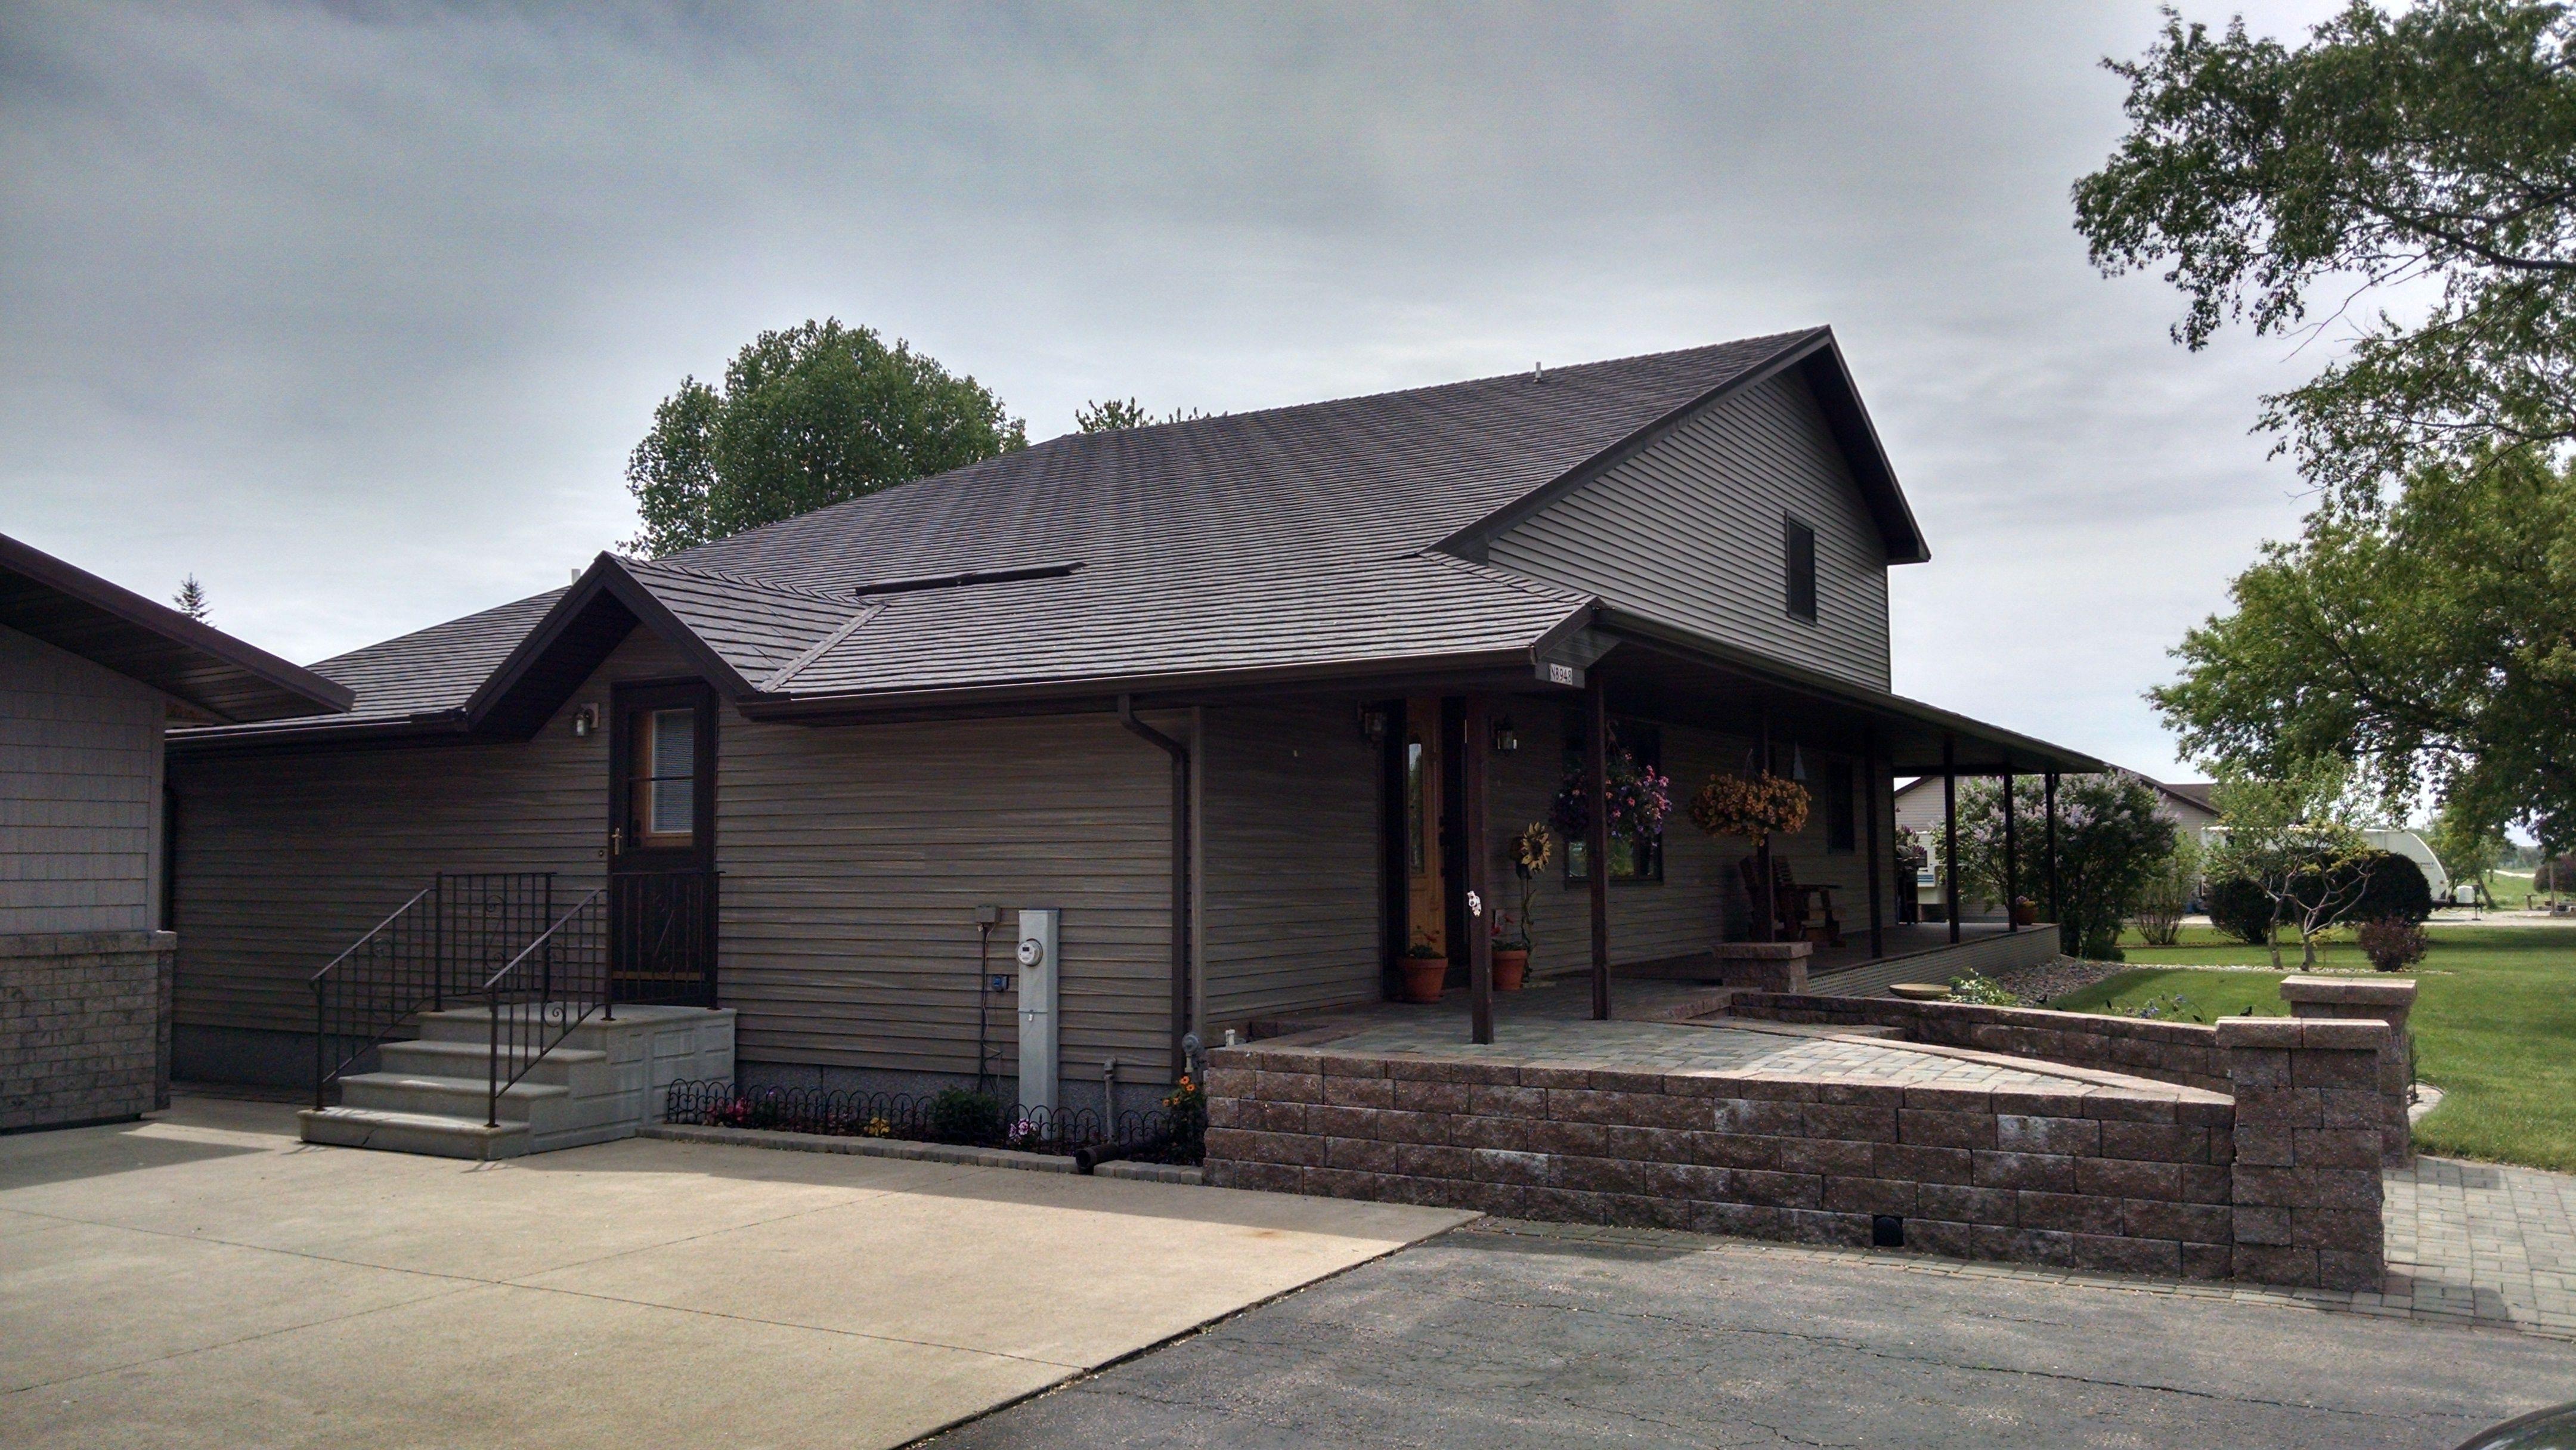 Gerard Stone Coated Metal Roof Made To Look Like Shingles But Lasts A Lifetime Metal Shingles Metal Shingle Roof Metal Roof